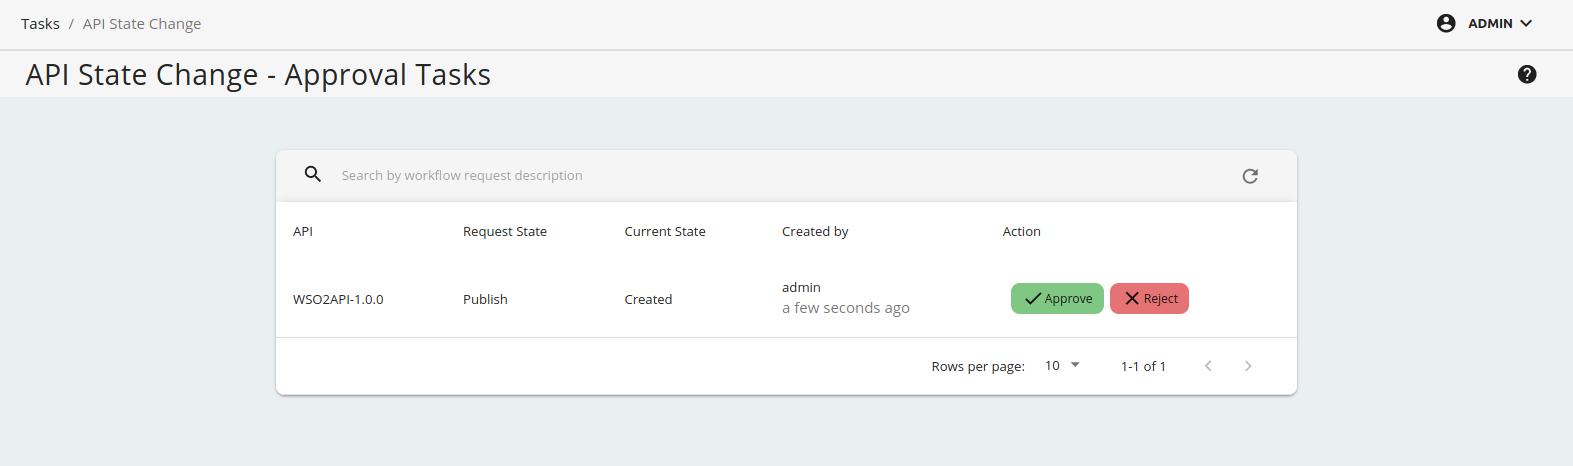 API state change pending list